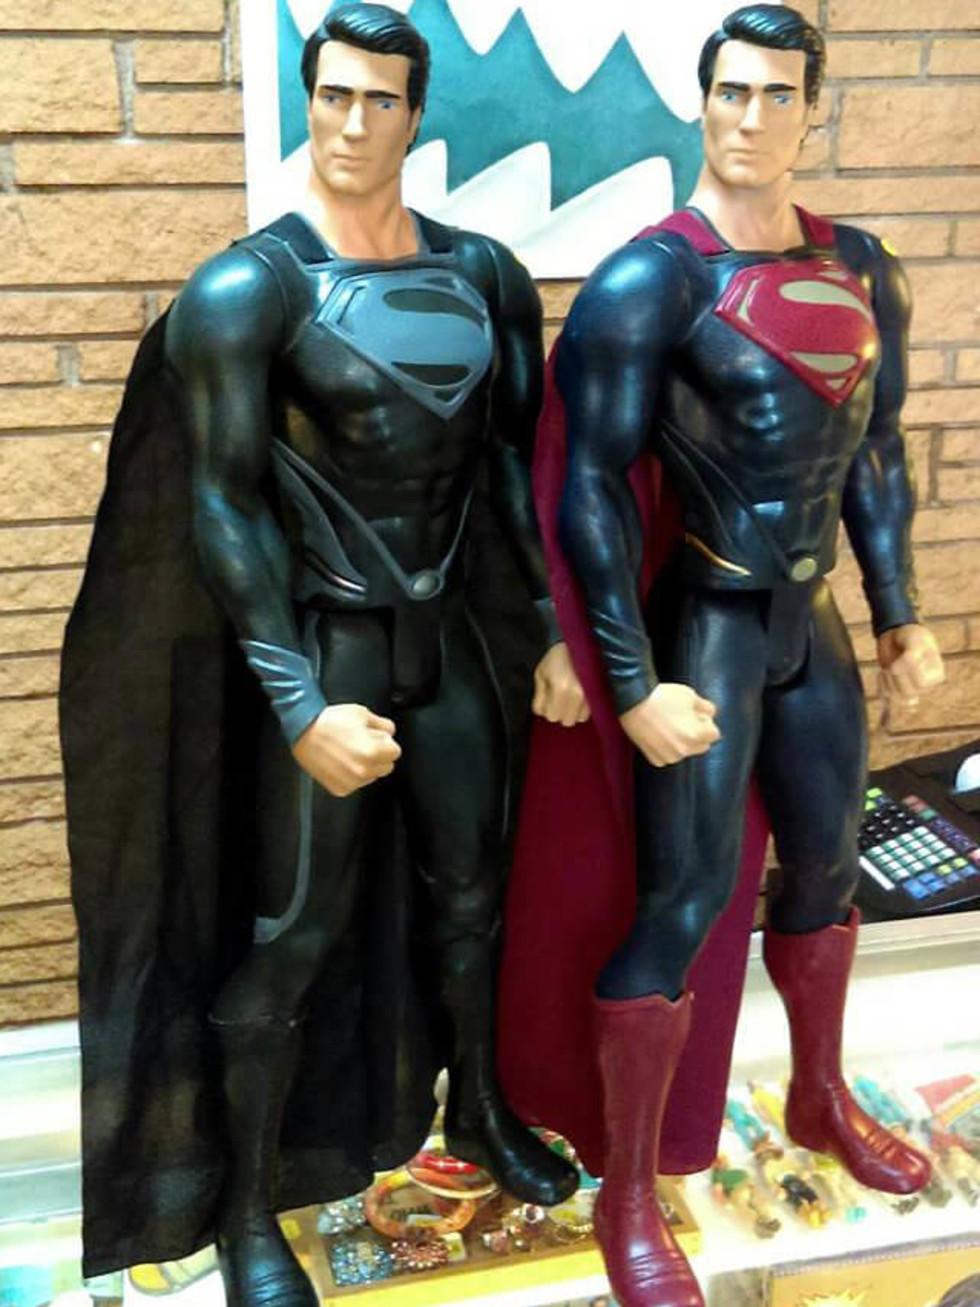 Superman figurines at Piranha Vintage store in East Dallas